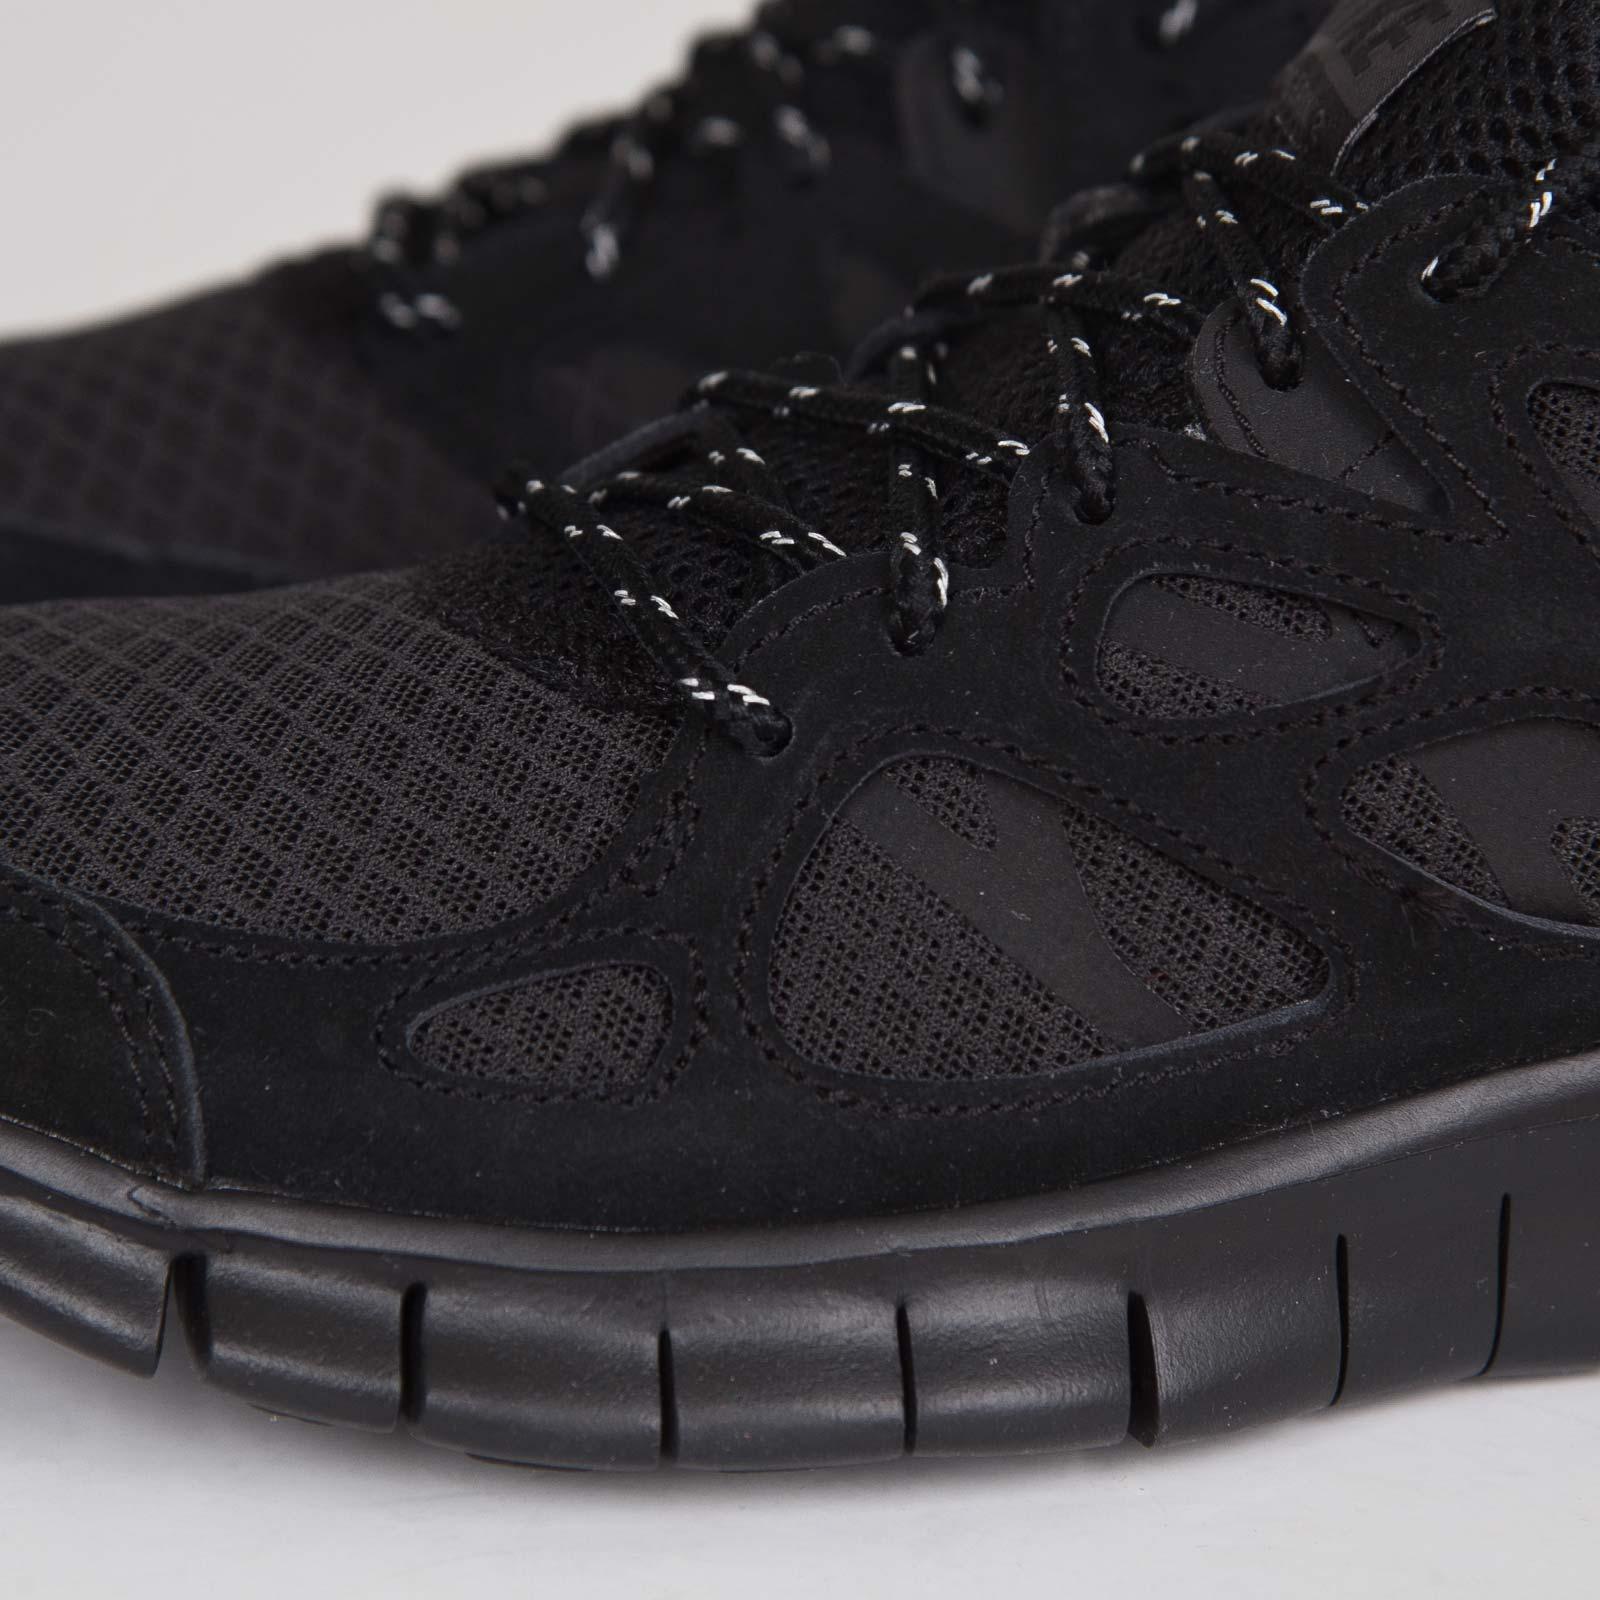 Nike Free Run 2 537732 020 Sneakersnstuff I Sneakers